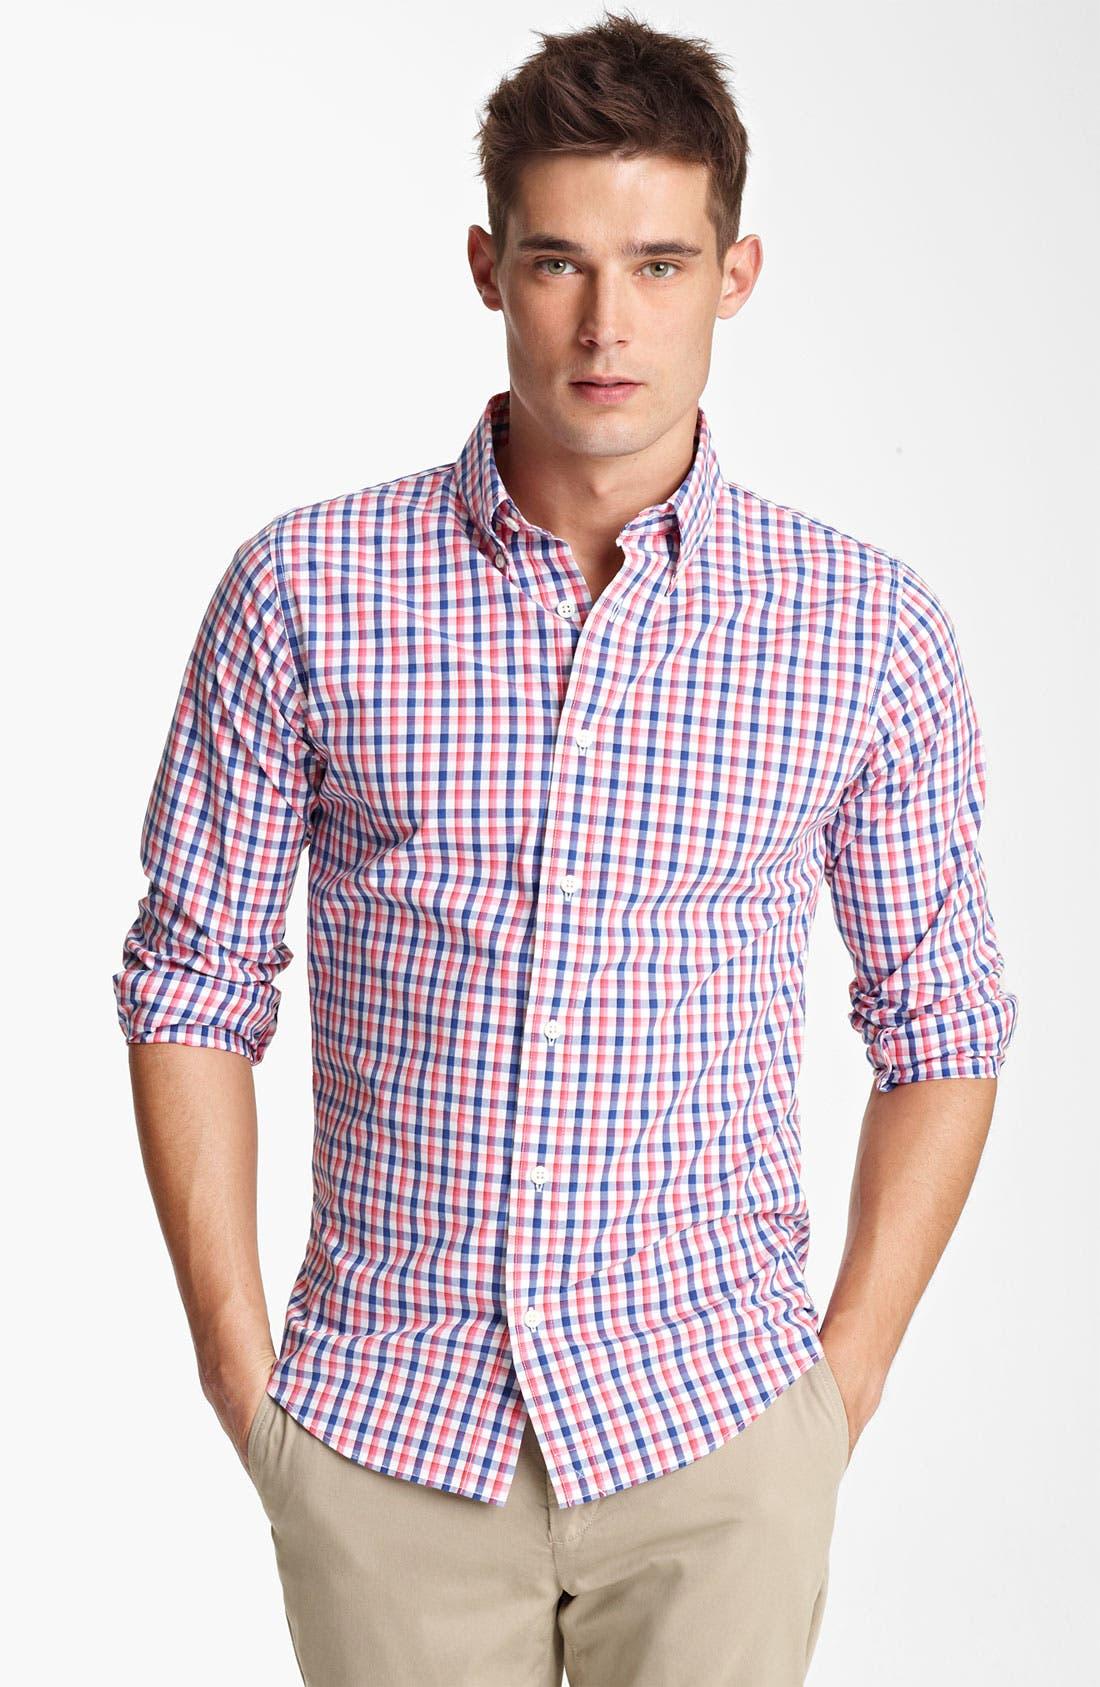 Main Image - Jack Spade 'Bailey' Gingham Check Shirt